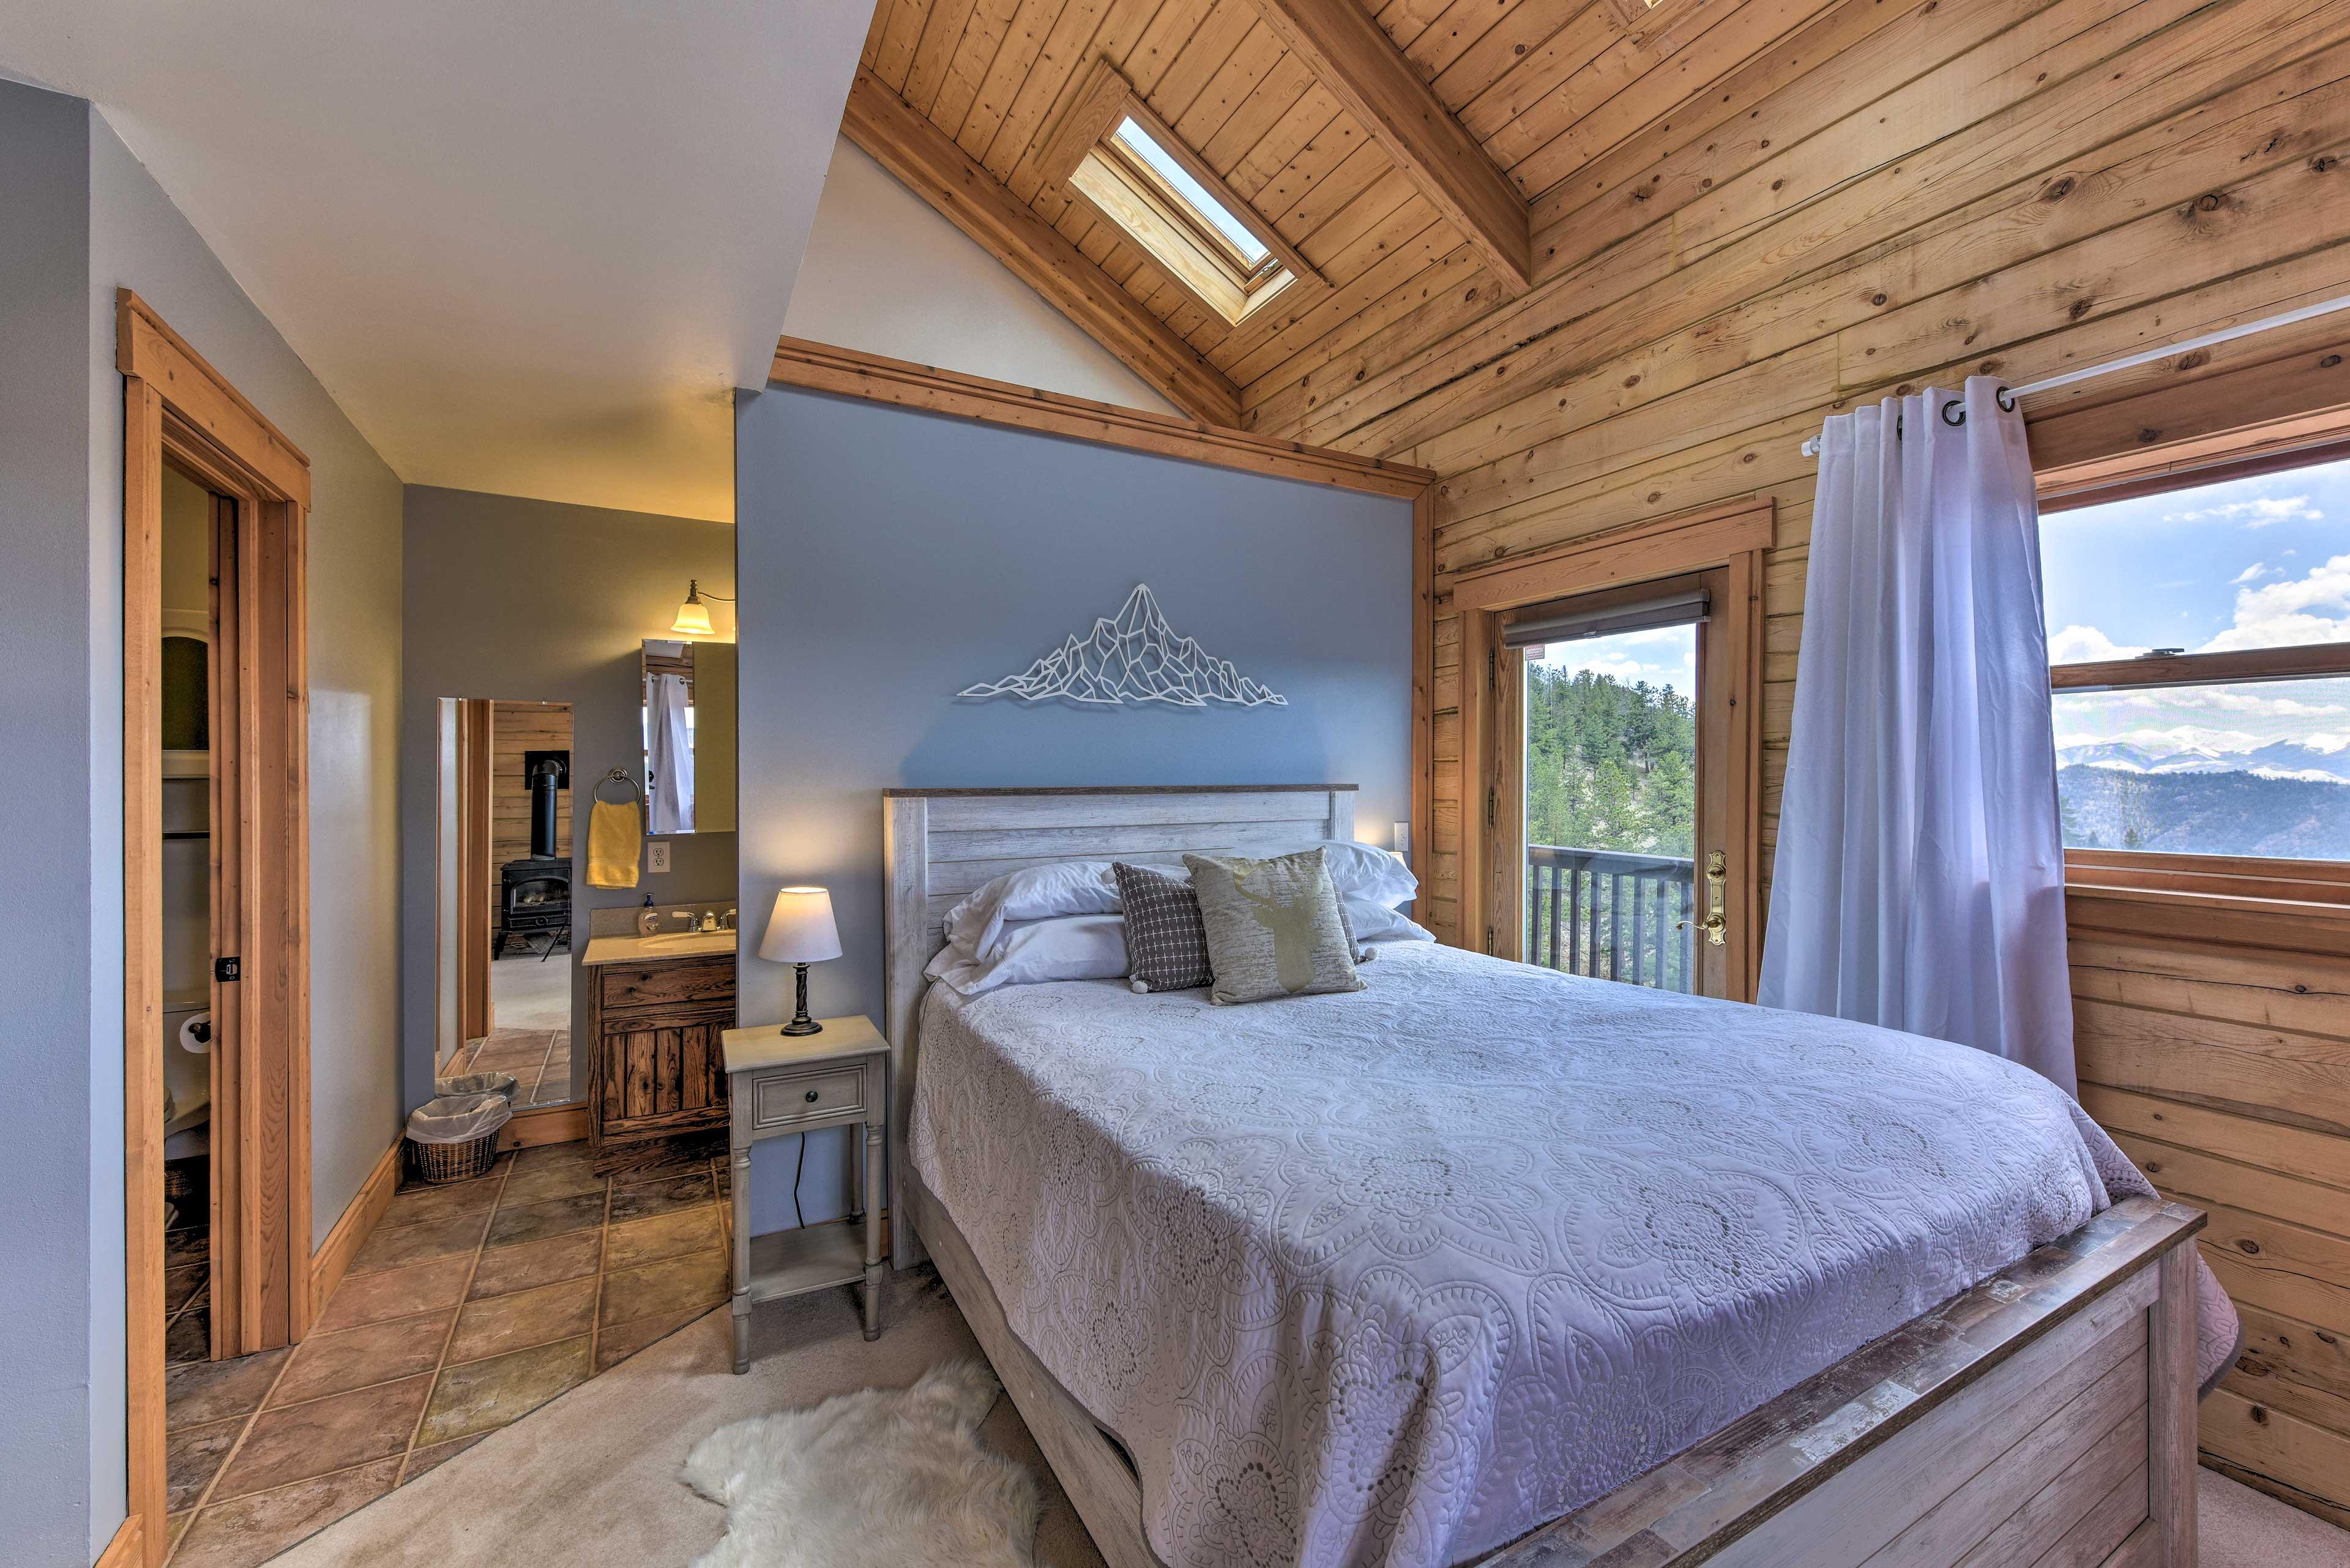 Wake up to beautiful views through the room's large windows.